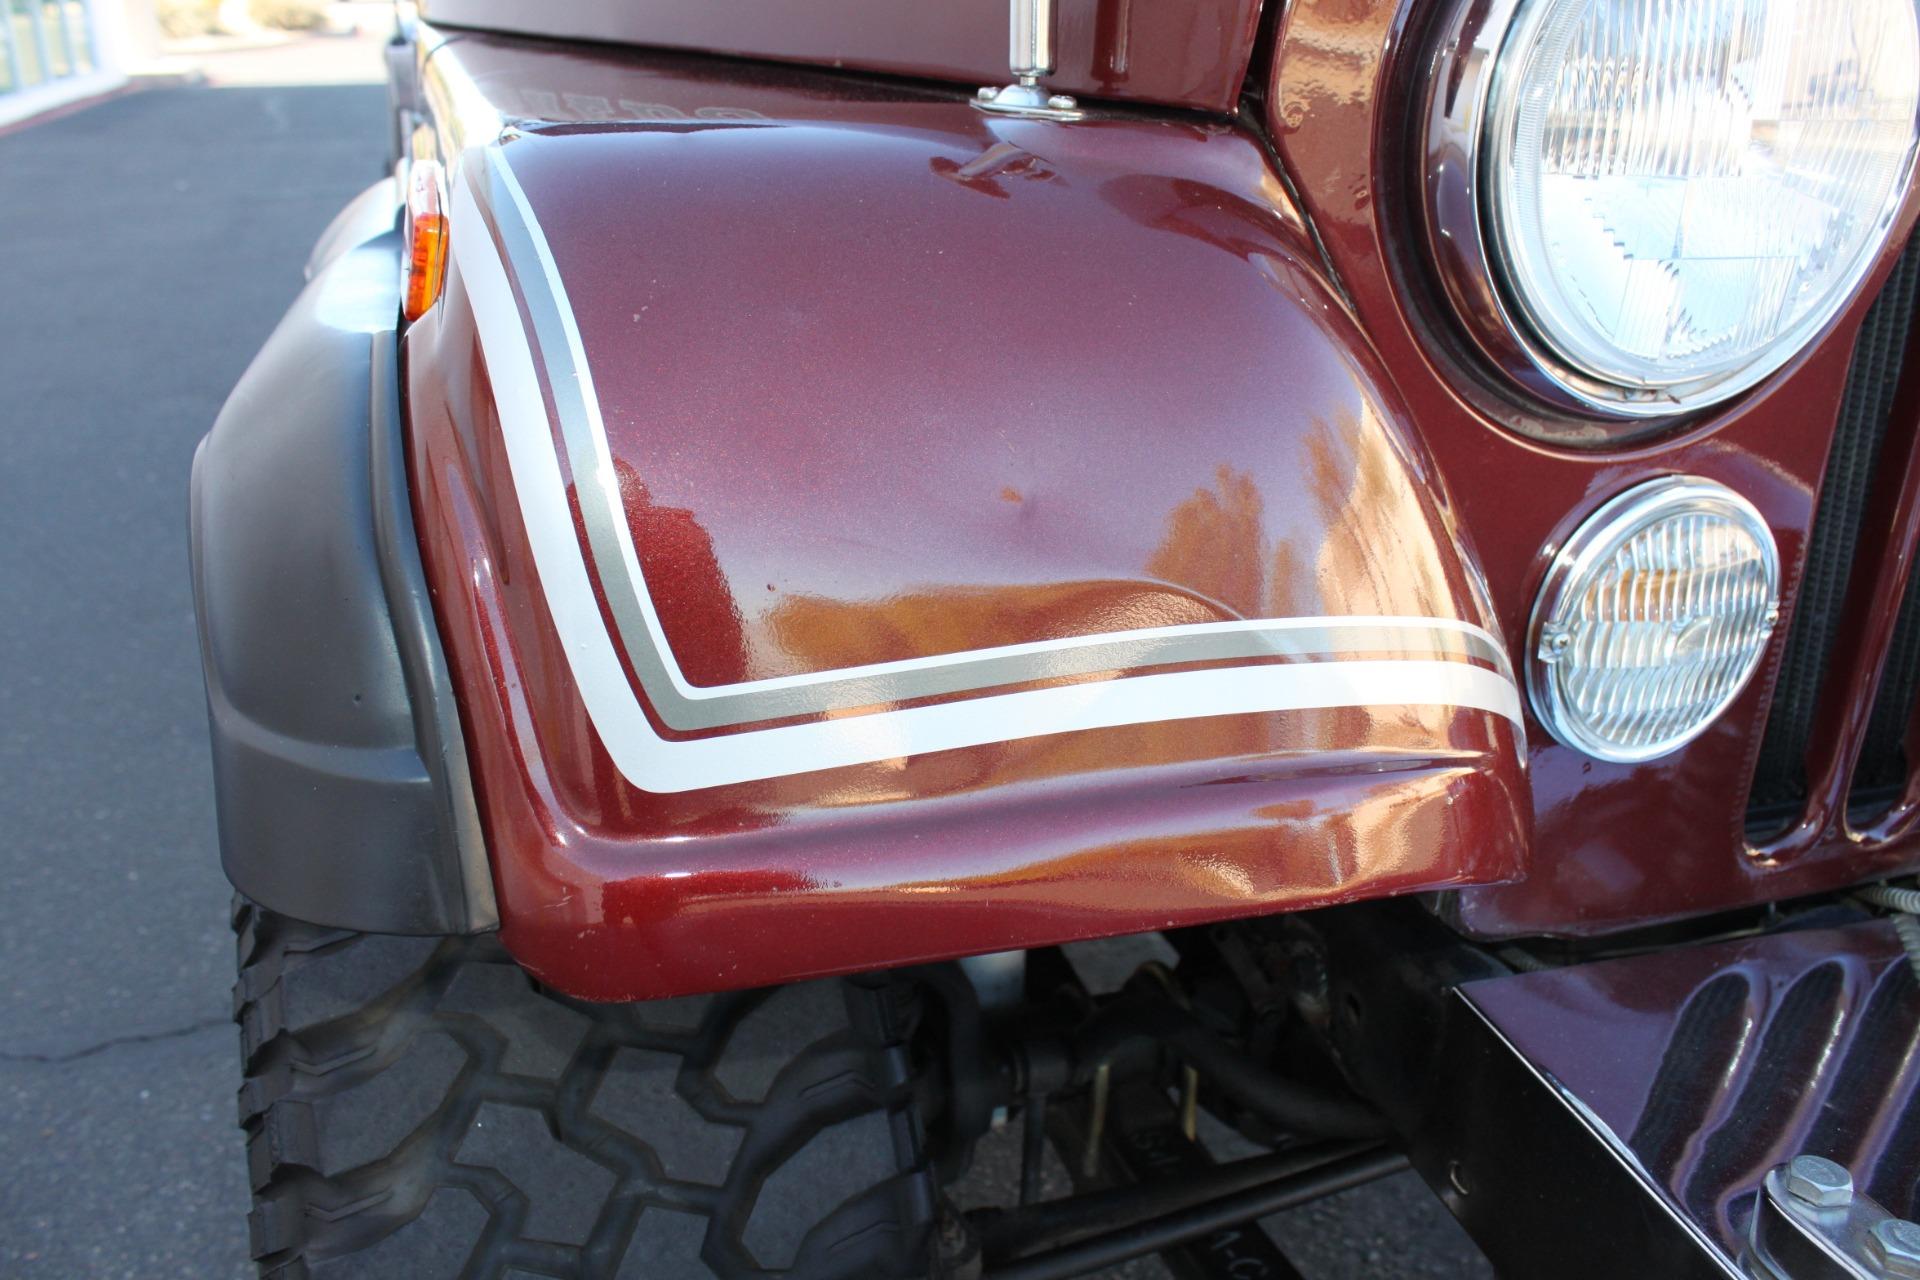 Used-1980-Jeep-CJ7-4WD-Lamborghini